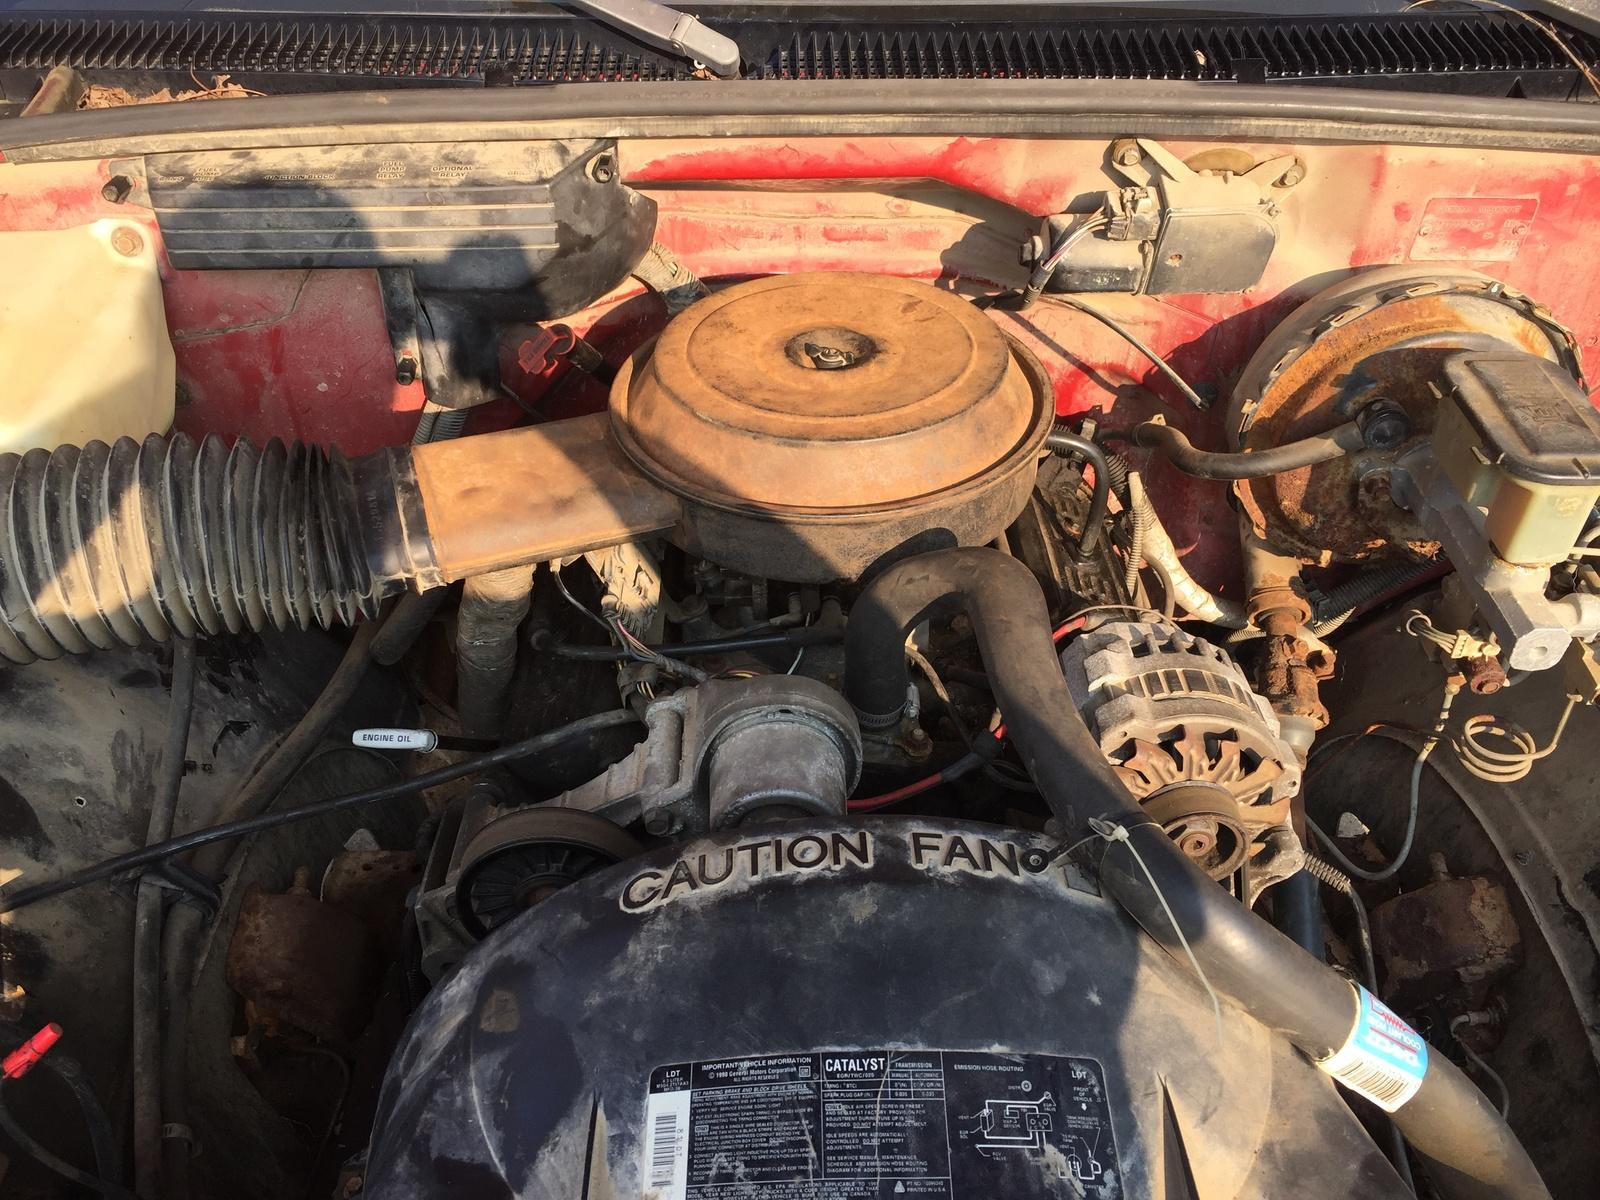 91 chevy silverado engine